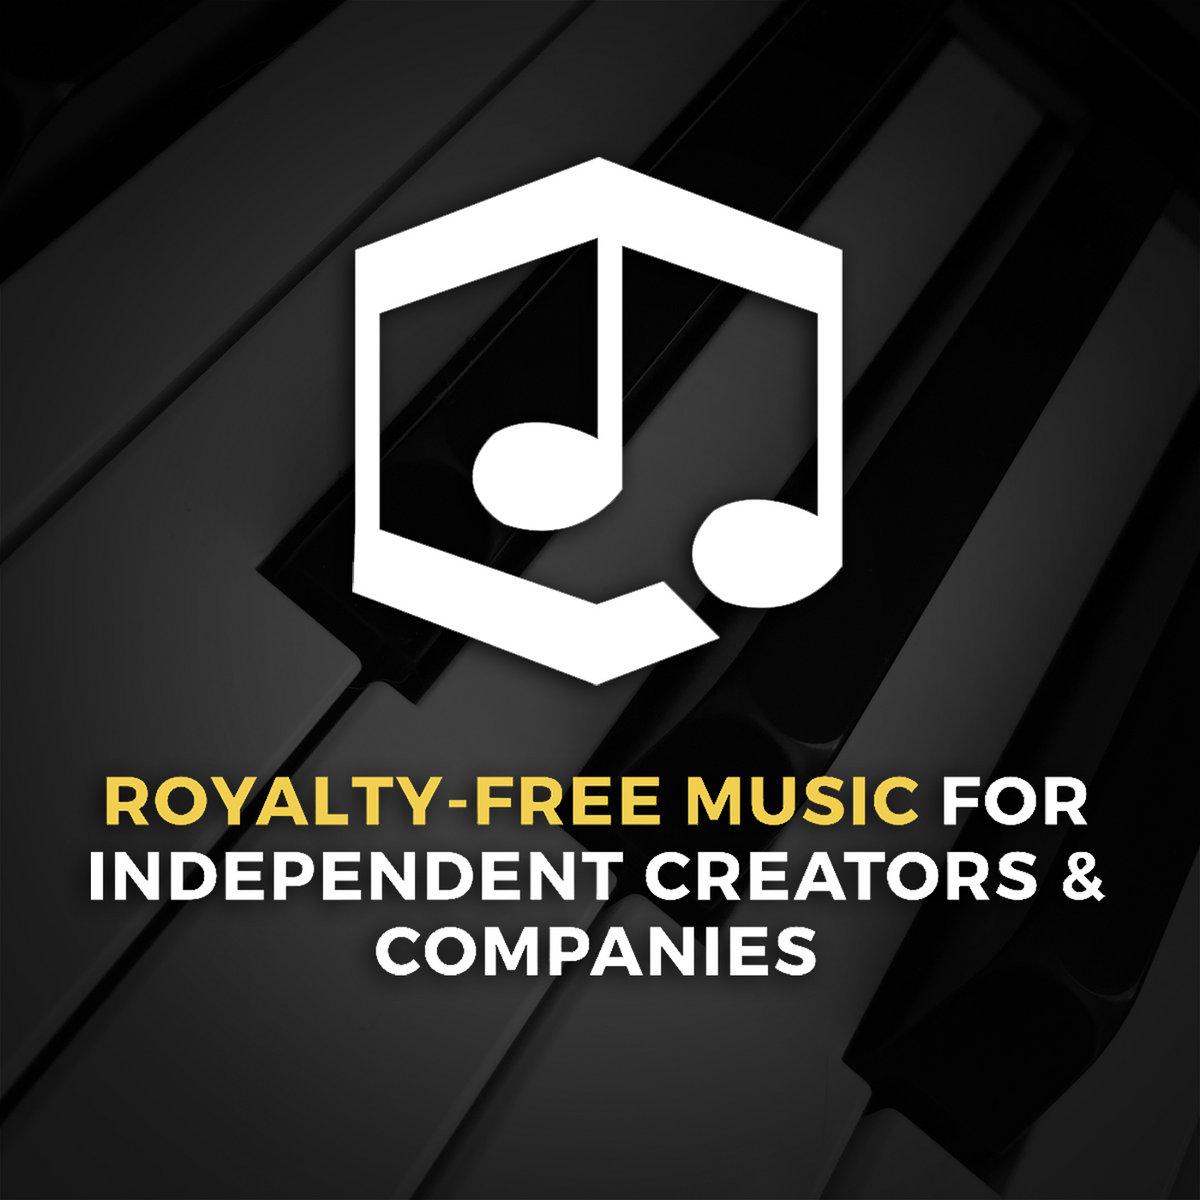 Music | Chris Collins - Royalty-Free Music